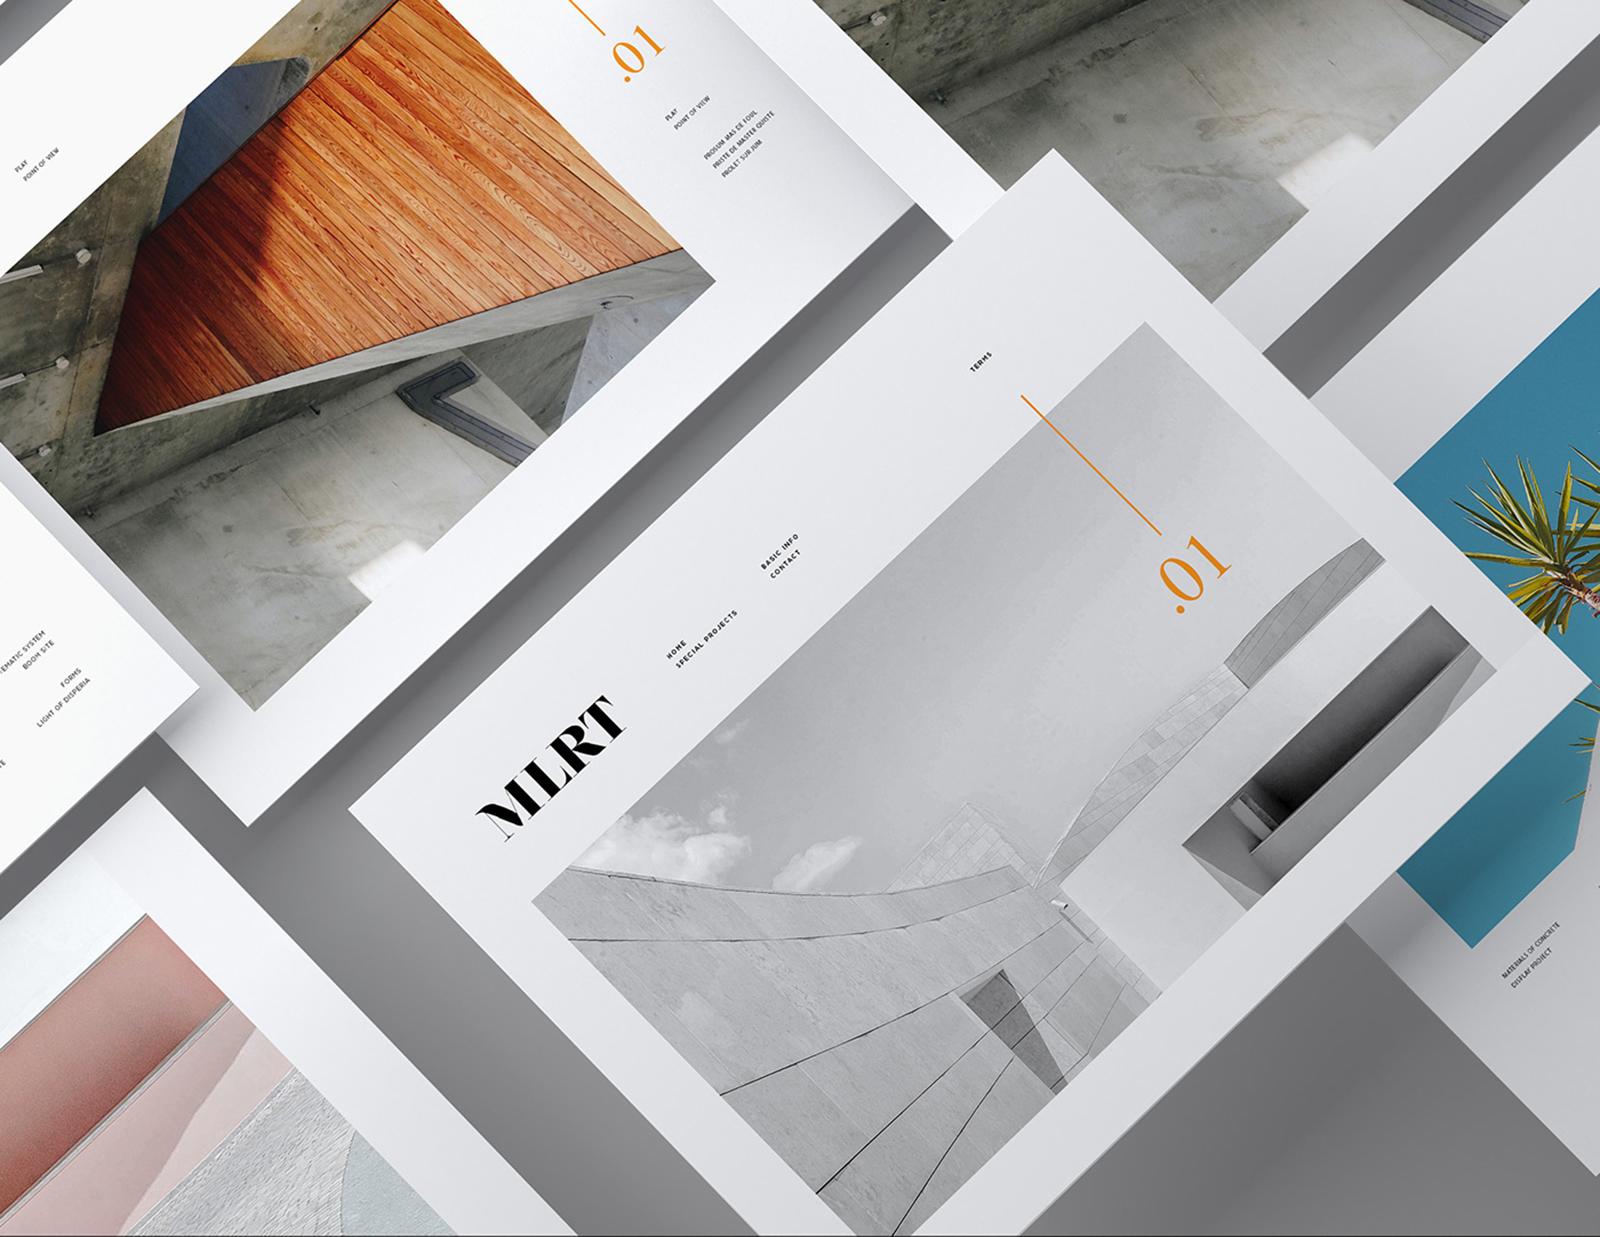 MLRT 企業品牌視覺VI形象設計欣賞-VI設計